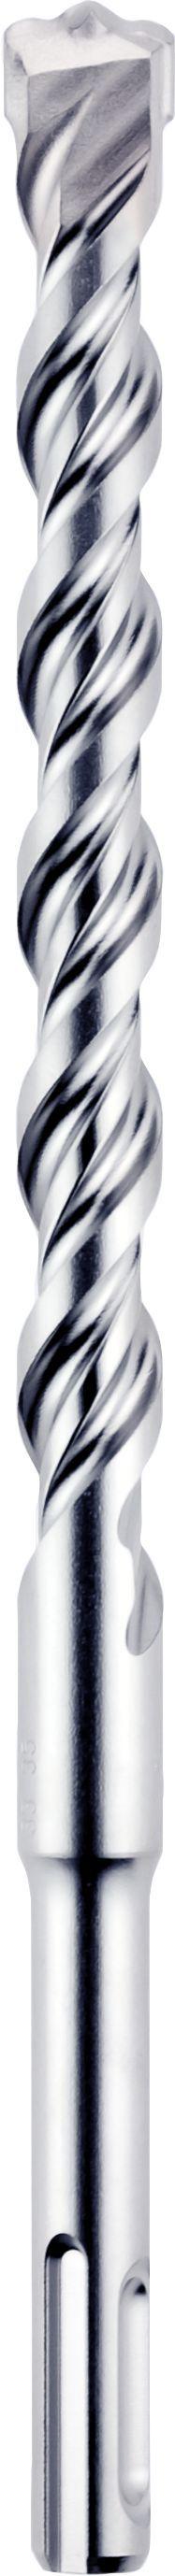 Slika BORER Rocket 3 SDS-plus 12x160 mm